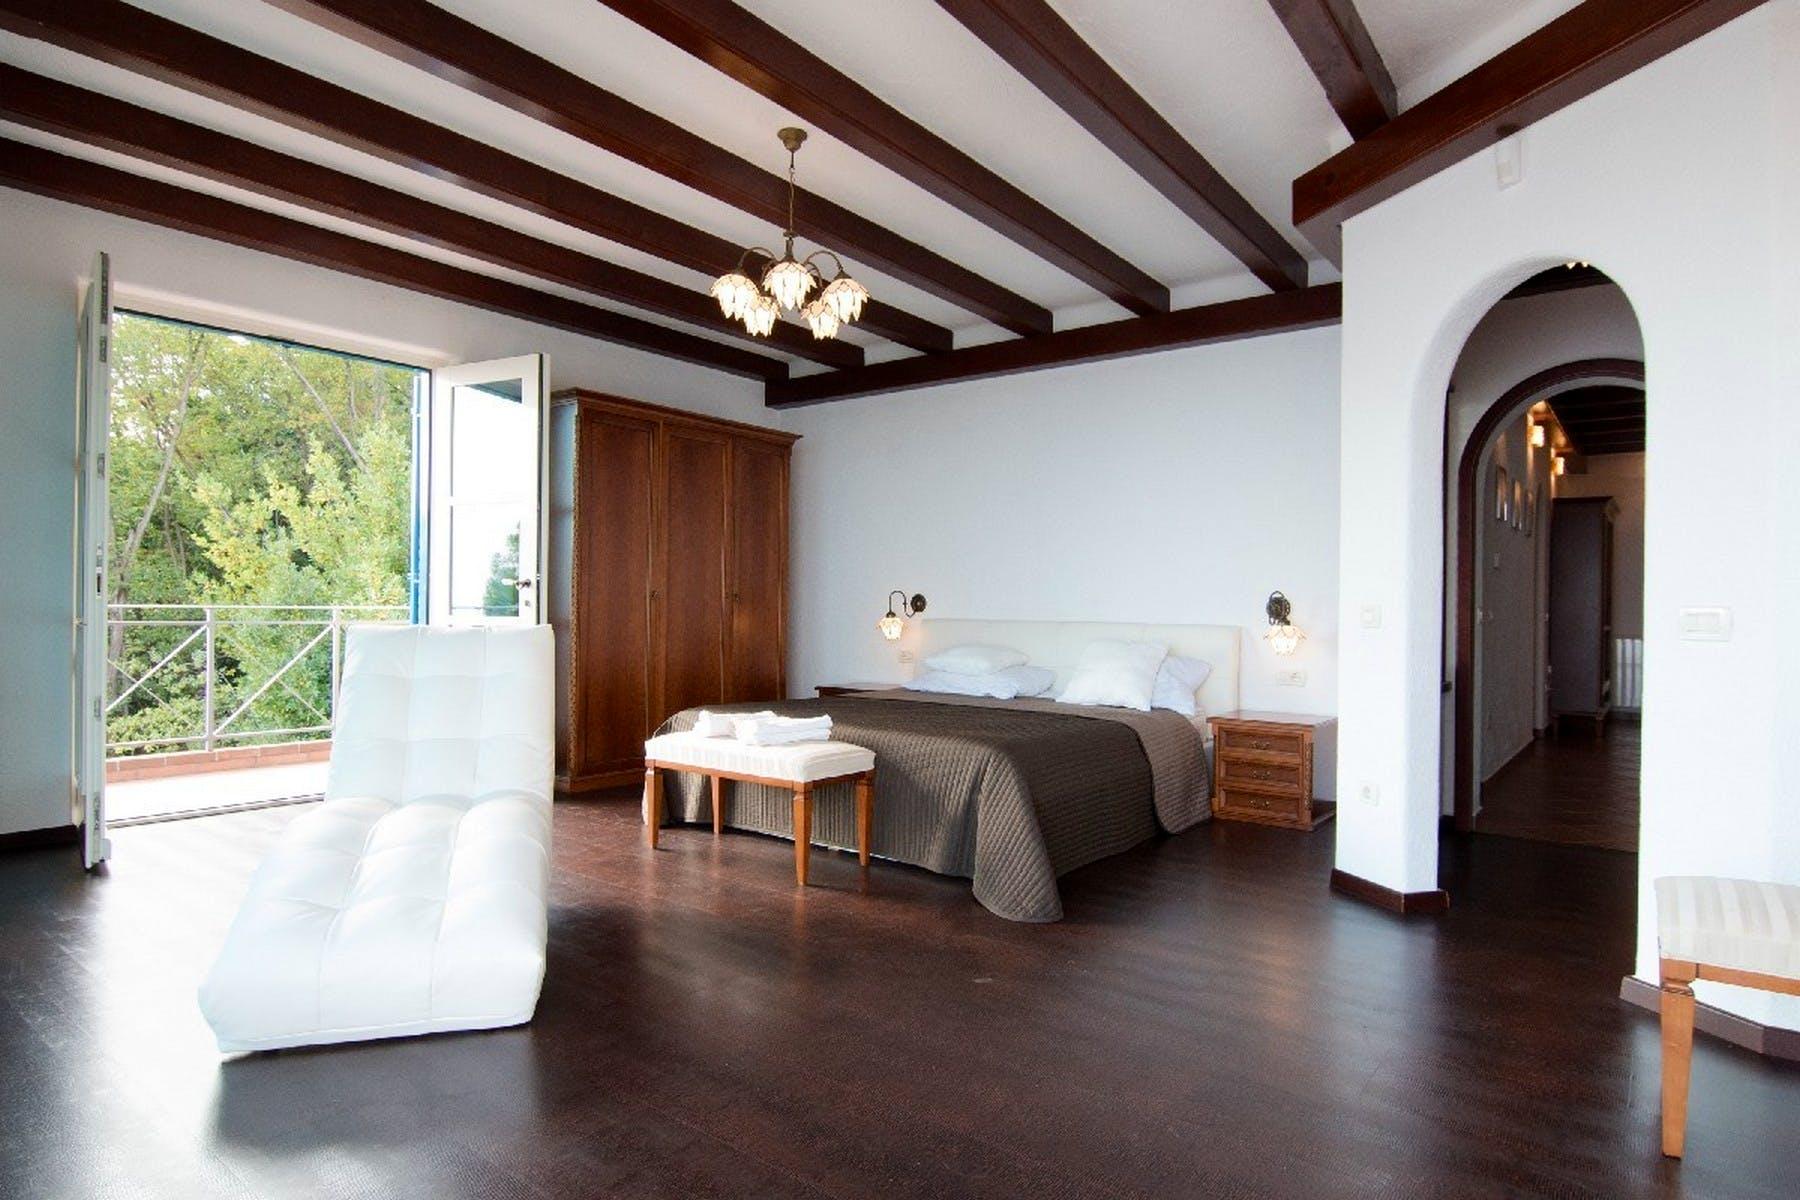 Dvokrevetna soba s terasom